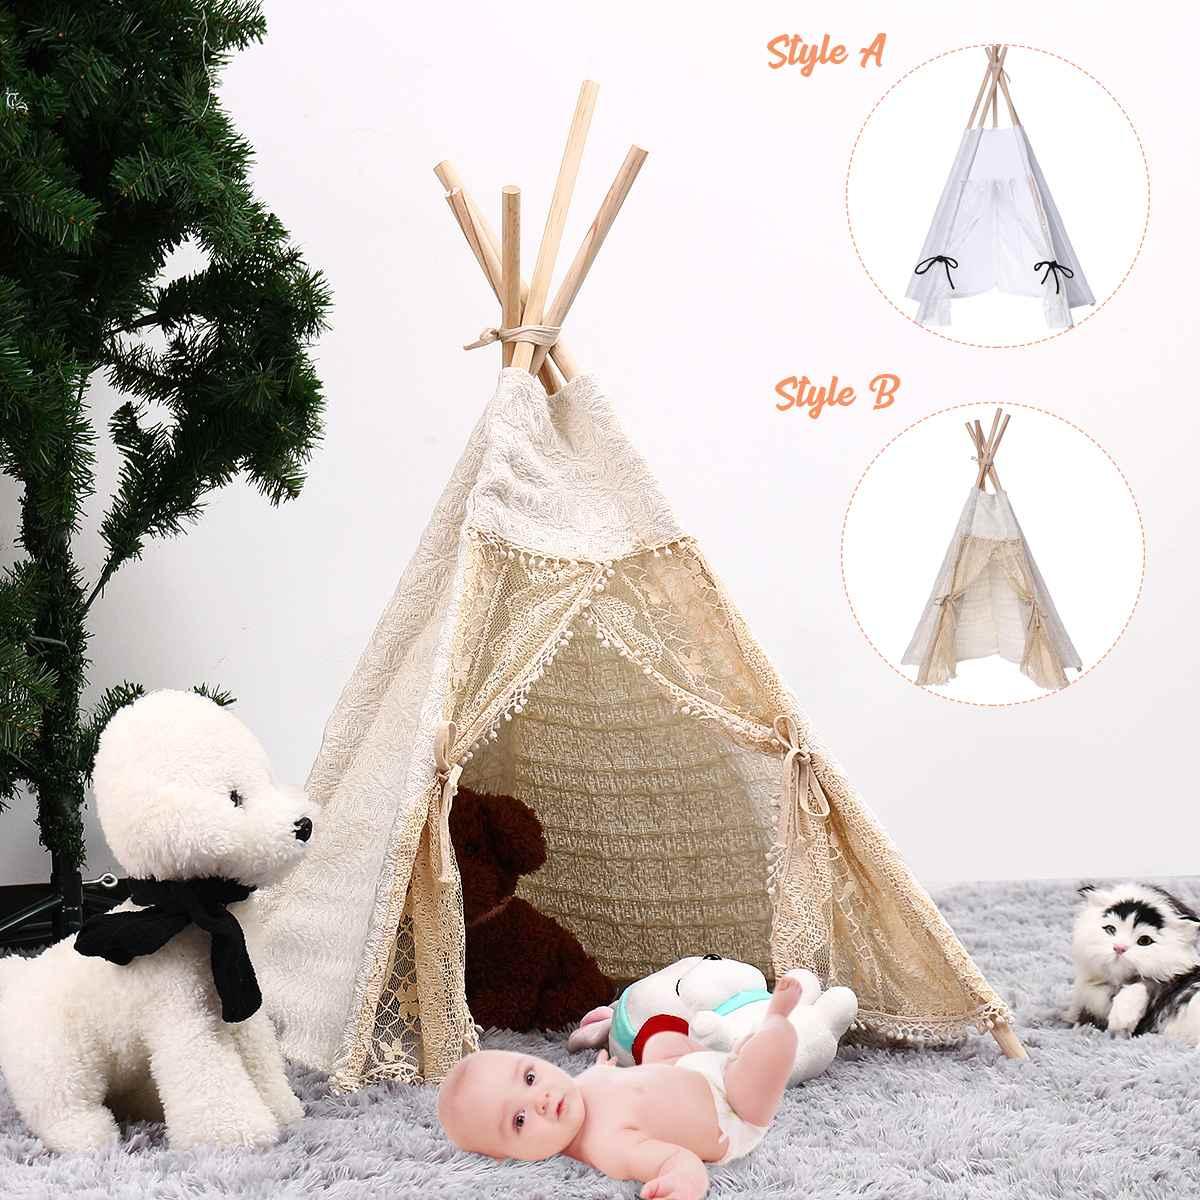 80cm-Large Canvas Teepee Tent Kids Sleeping Newborn Photography Photo Props Kids Teepee Tipi House Children Tipi Tee Tent